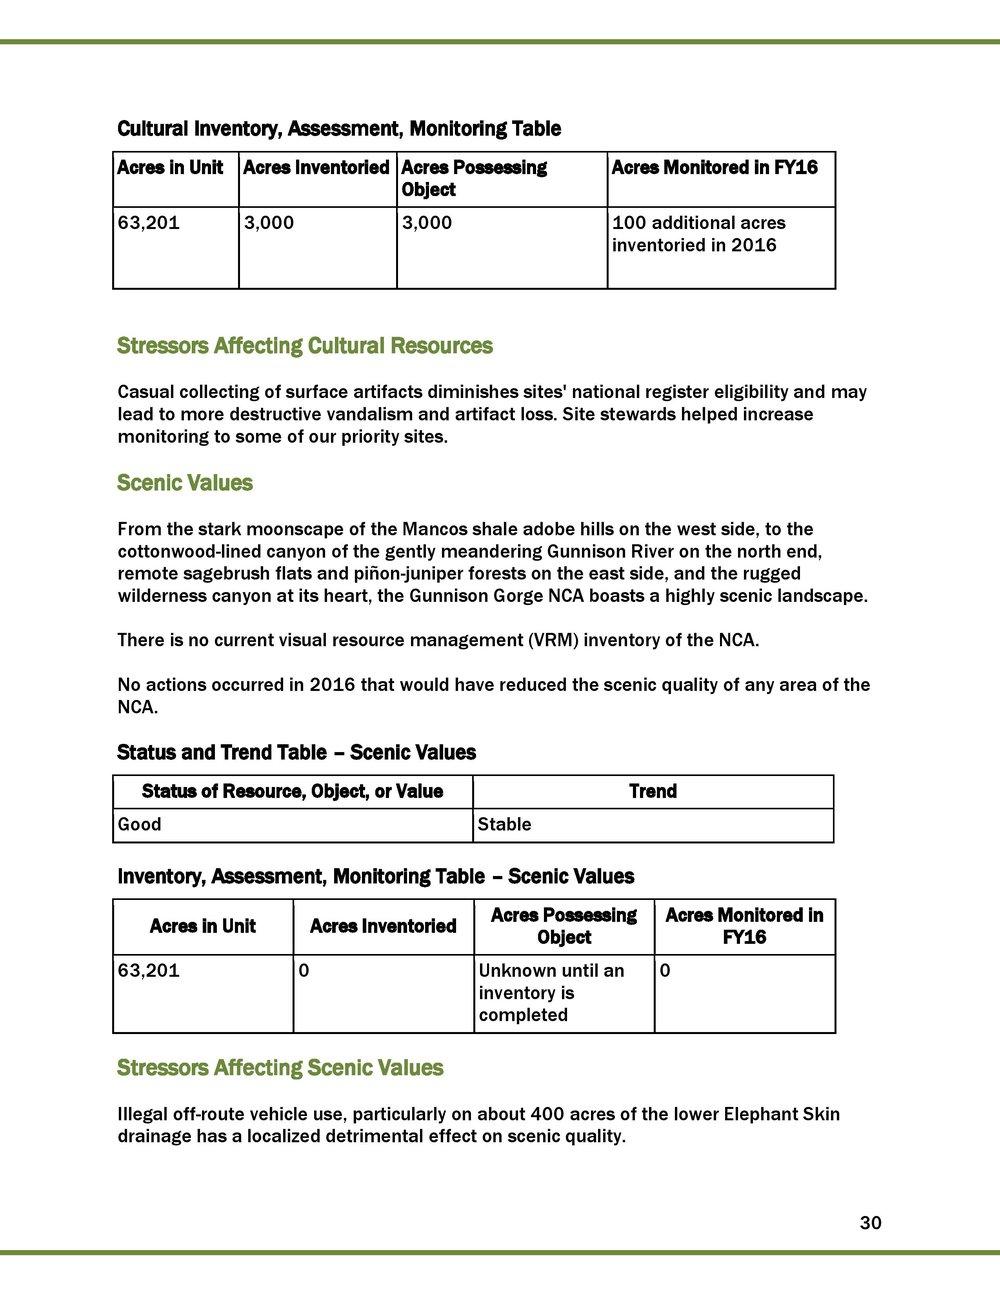 2016 FINAL GGNCA REPORT_2017_02_01-page-031.jpg